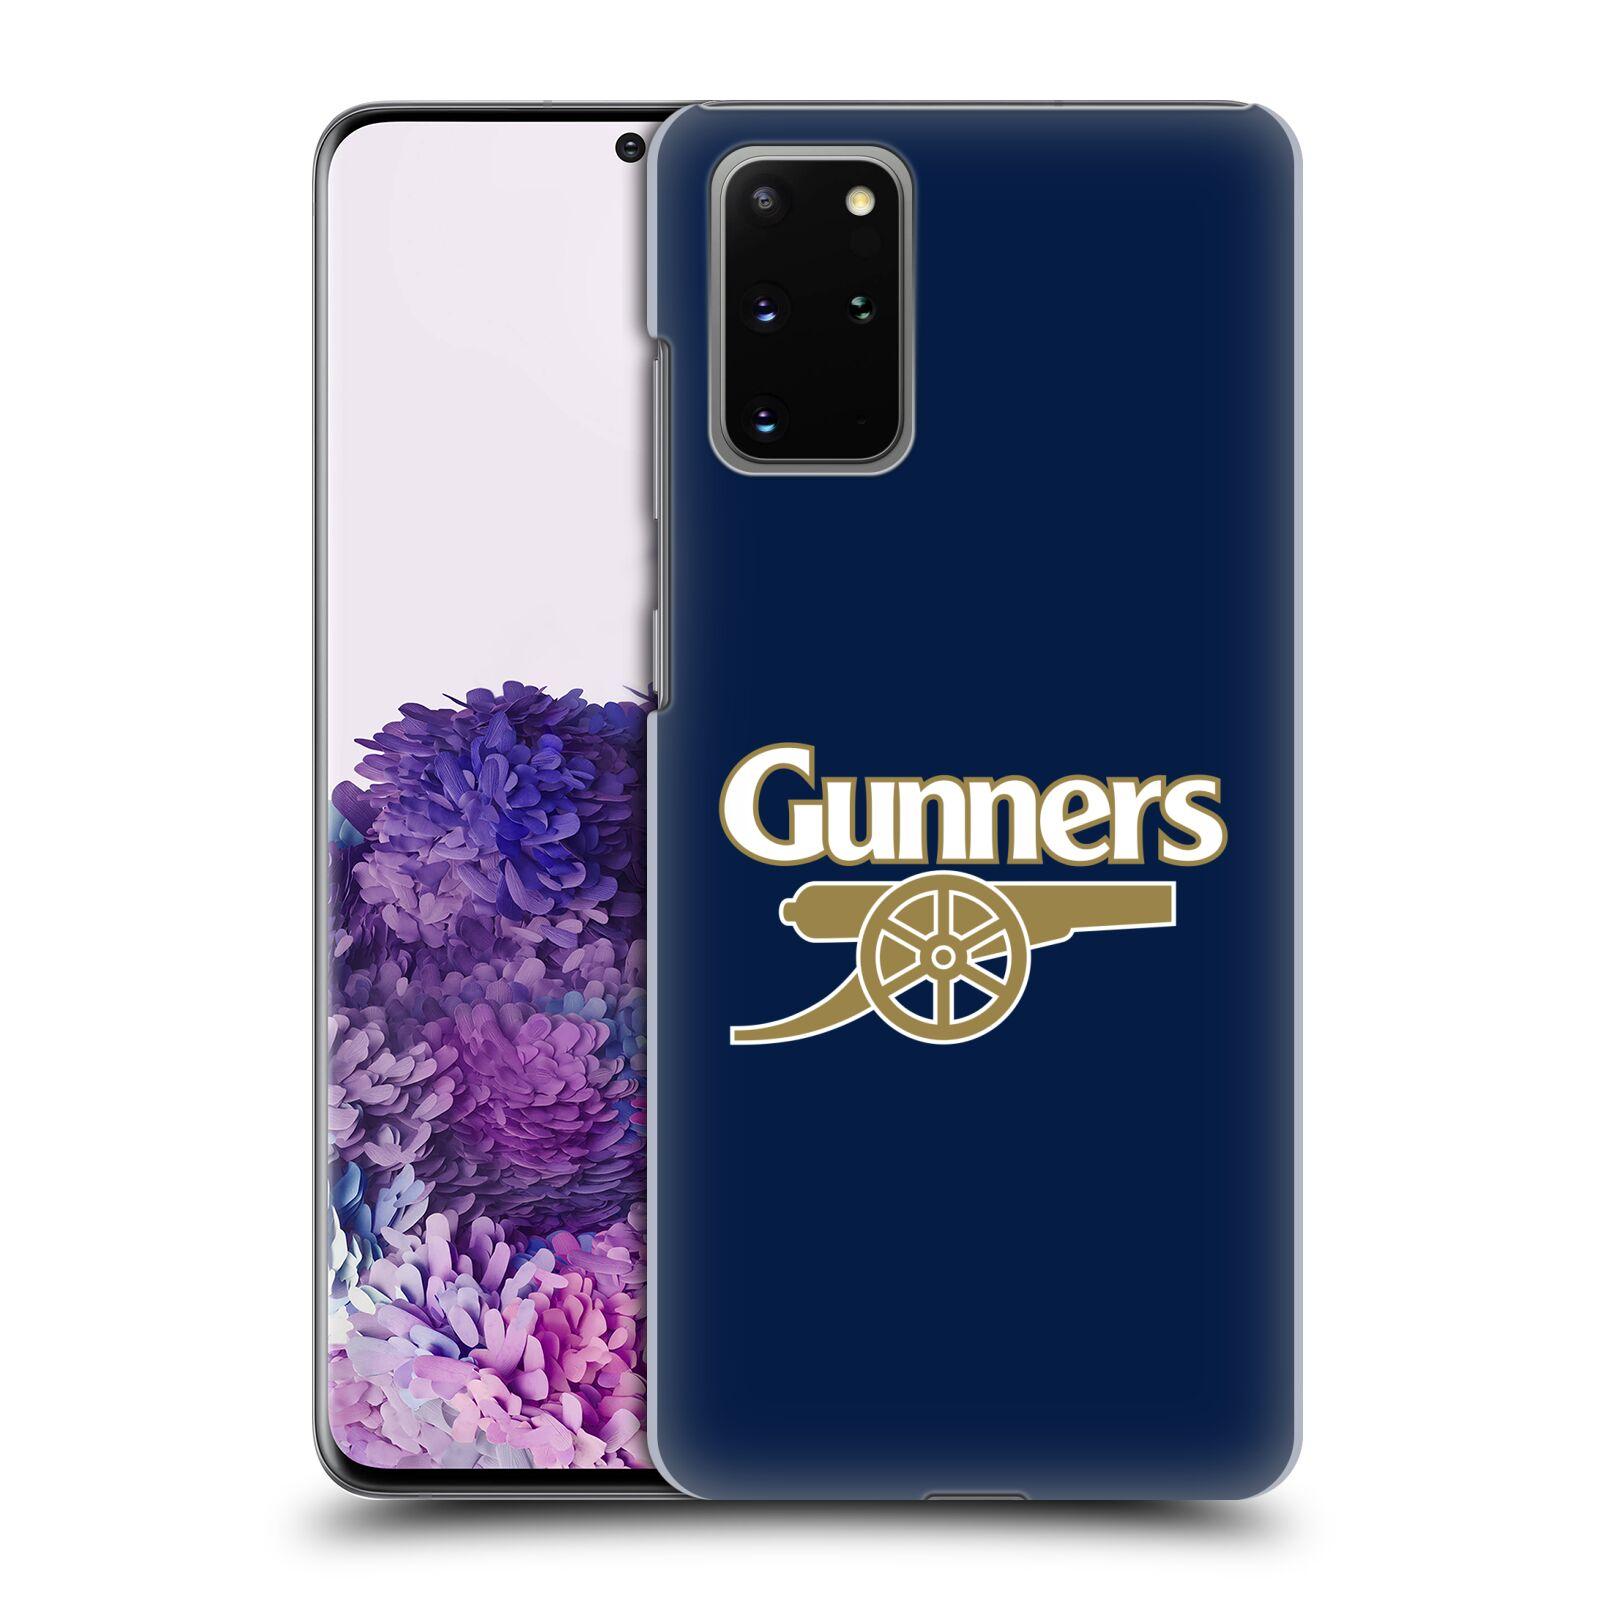 Plastové pouzdro na mobil Samsung Galaxy S20 Plus - Head Case - Arsenal FC - Gunners